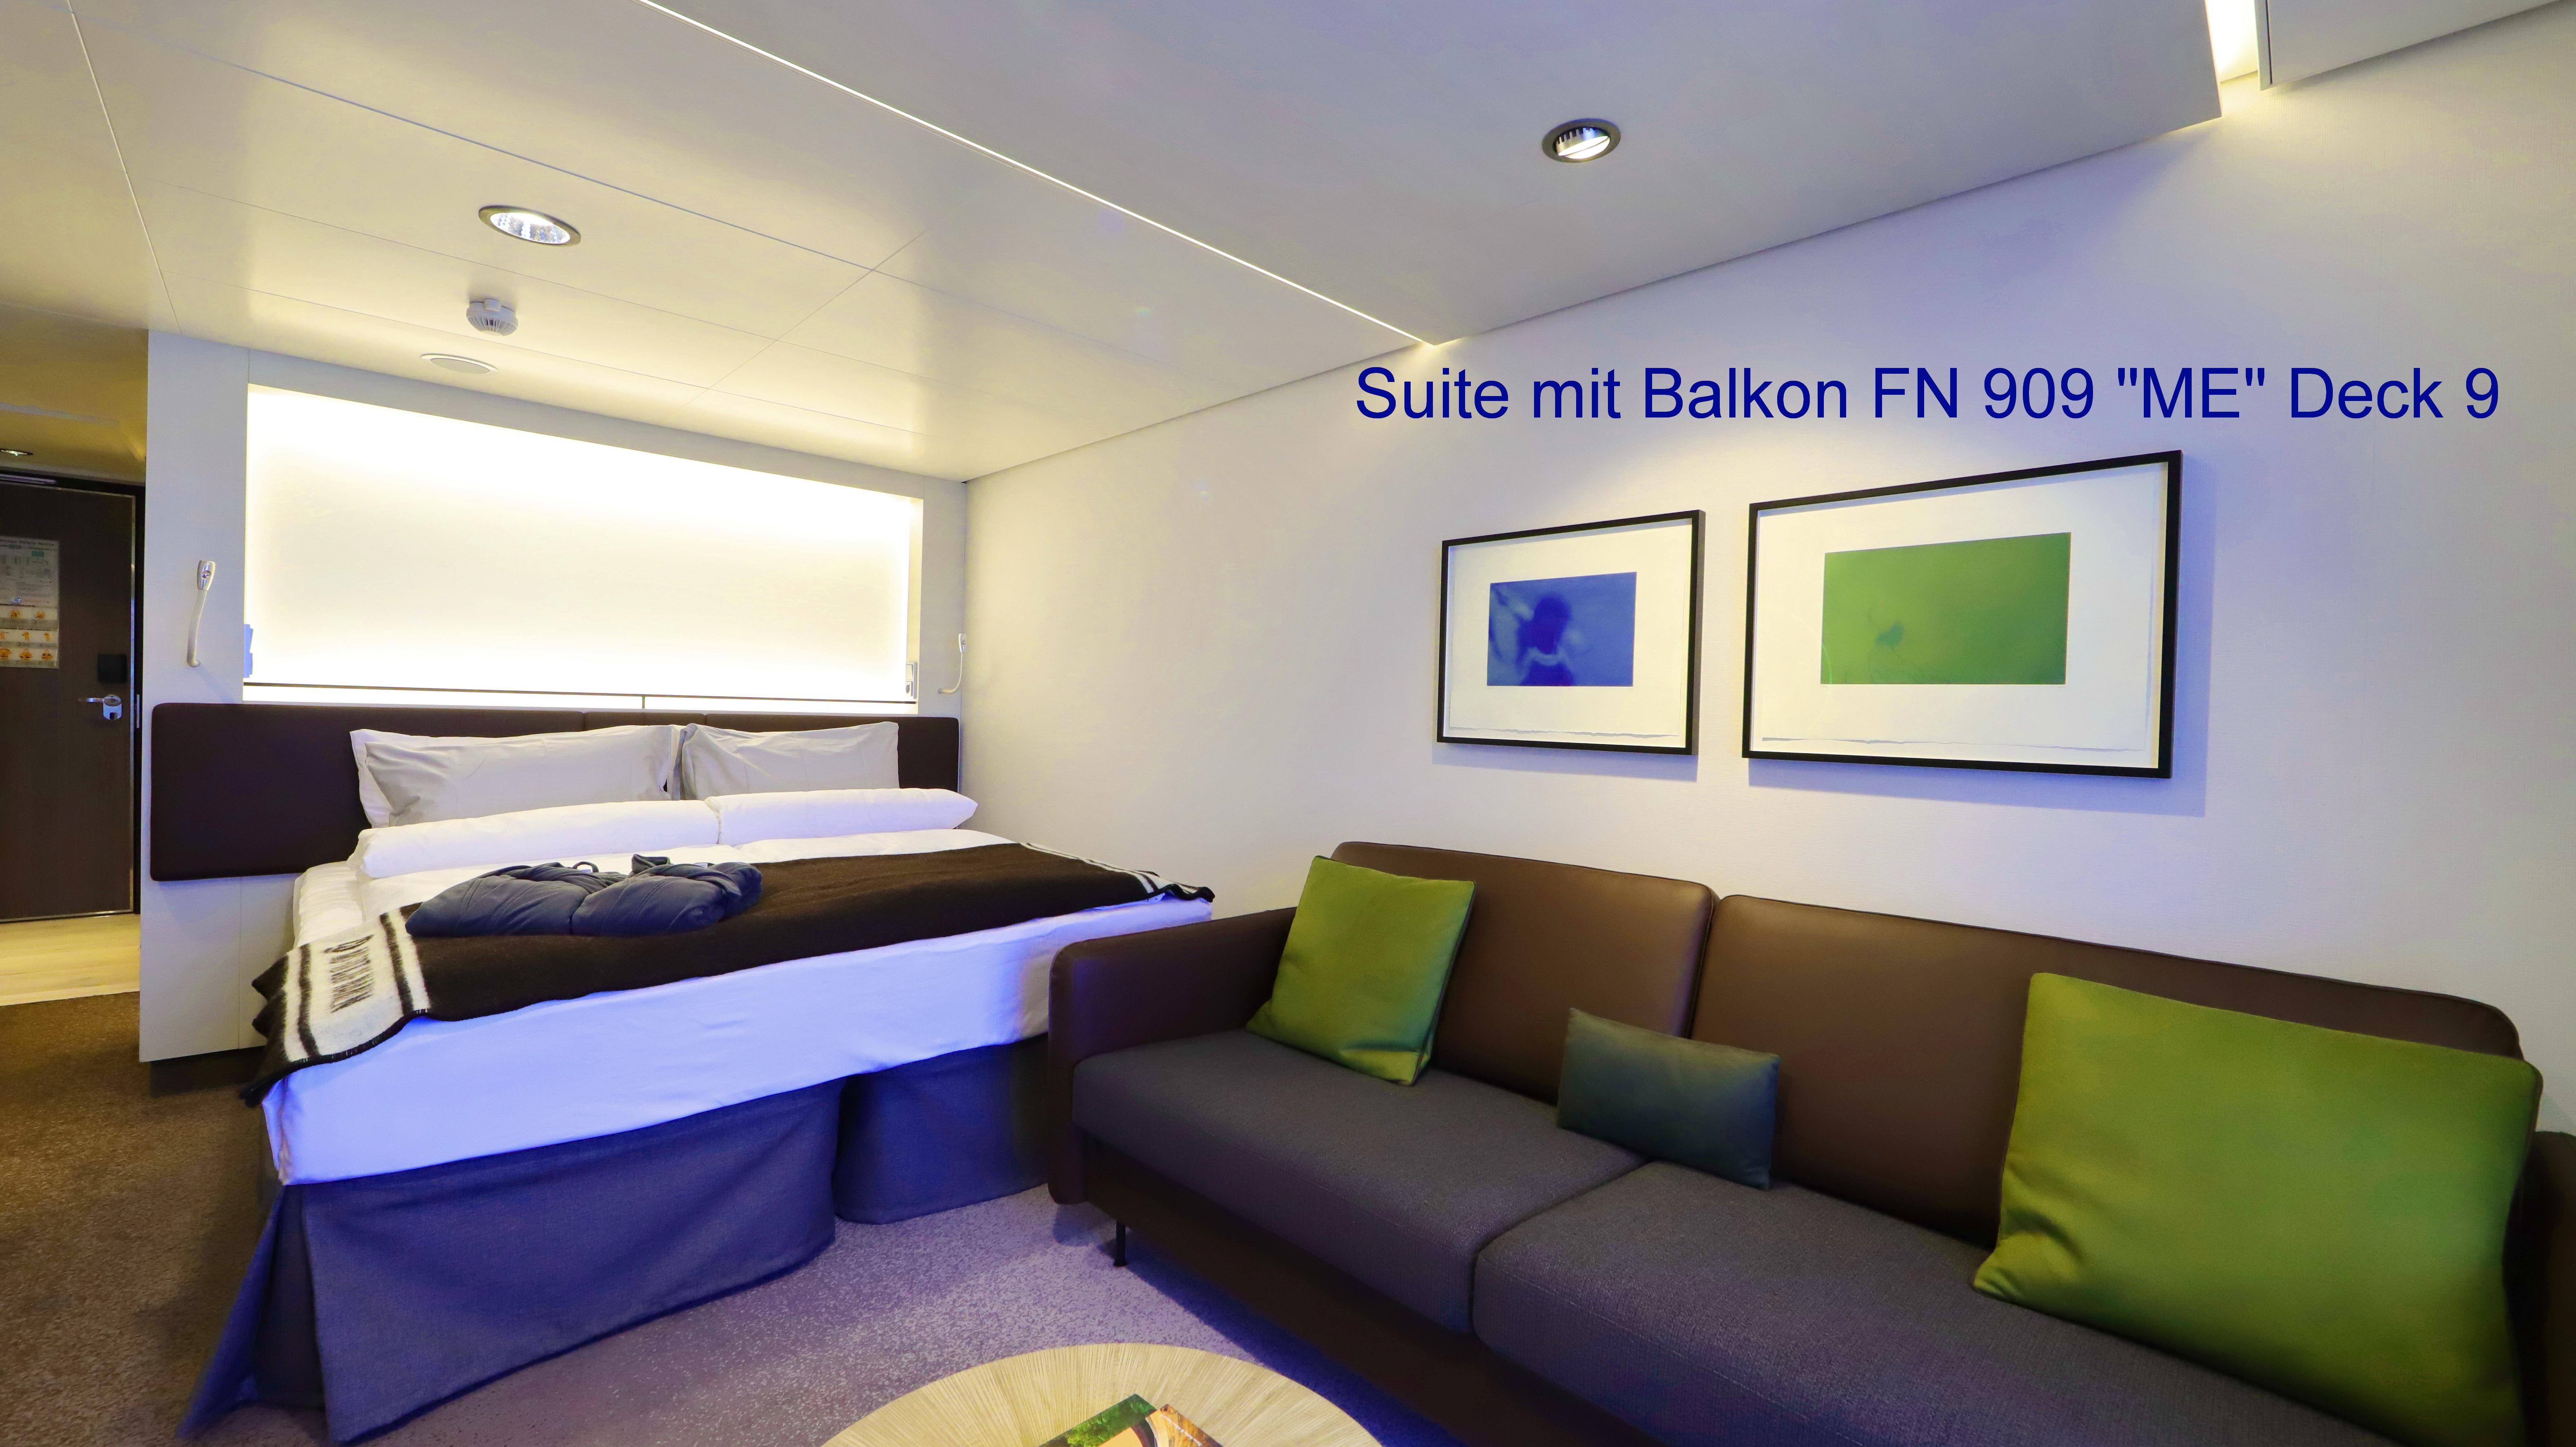 ©HorstReitz FN Balkonkabine 909 ME